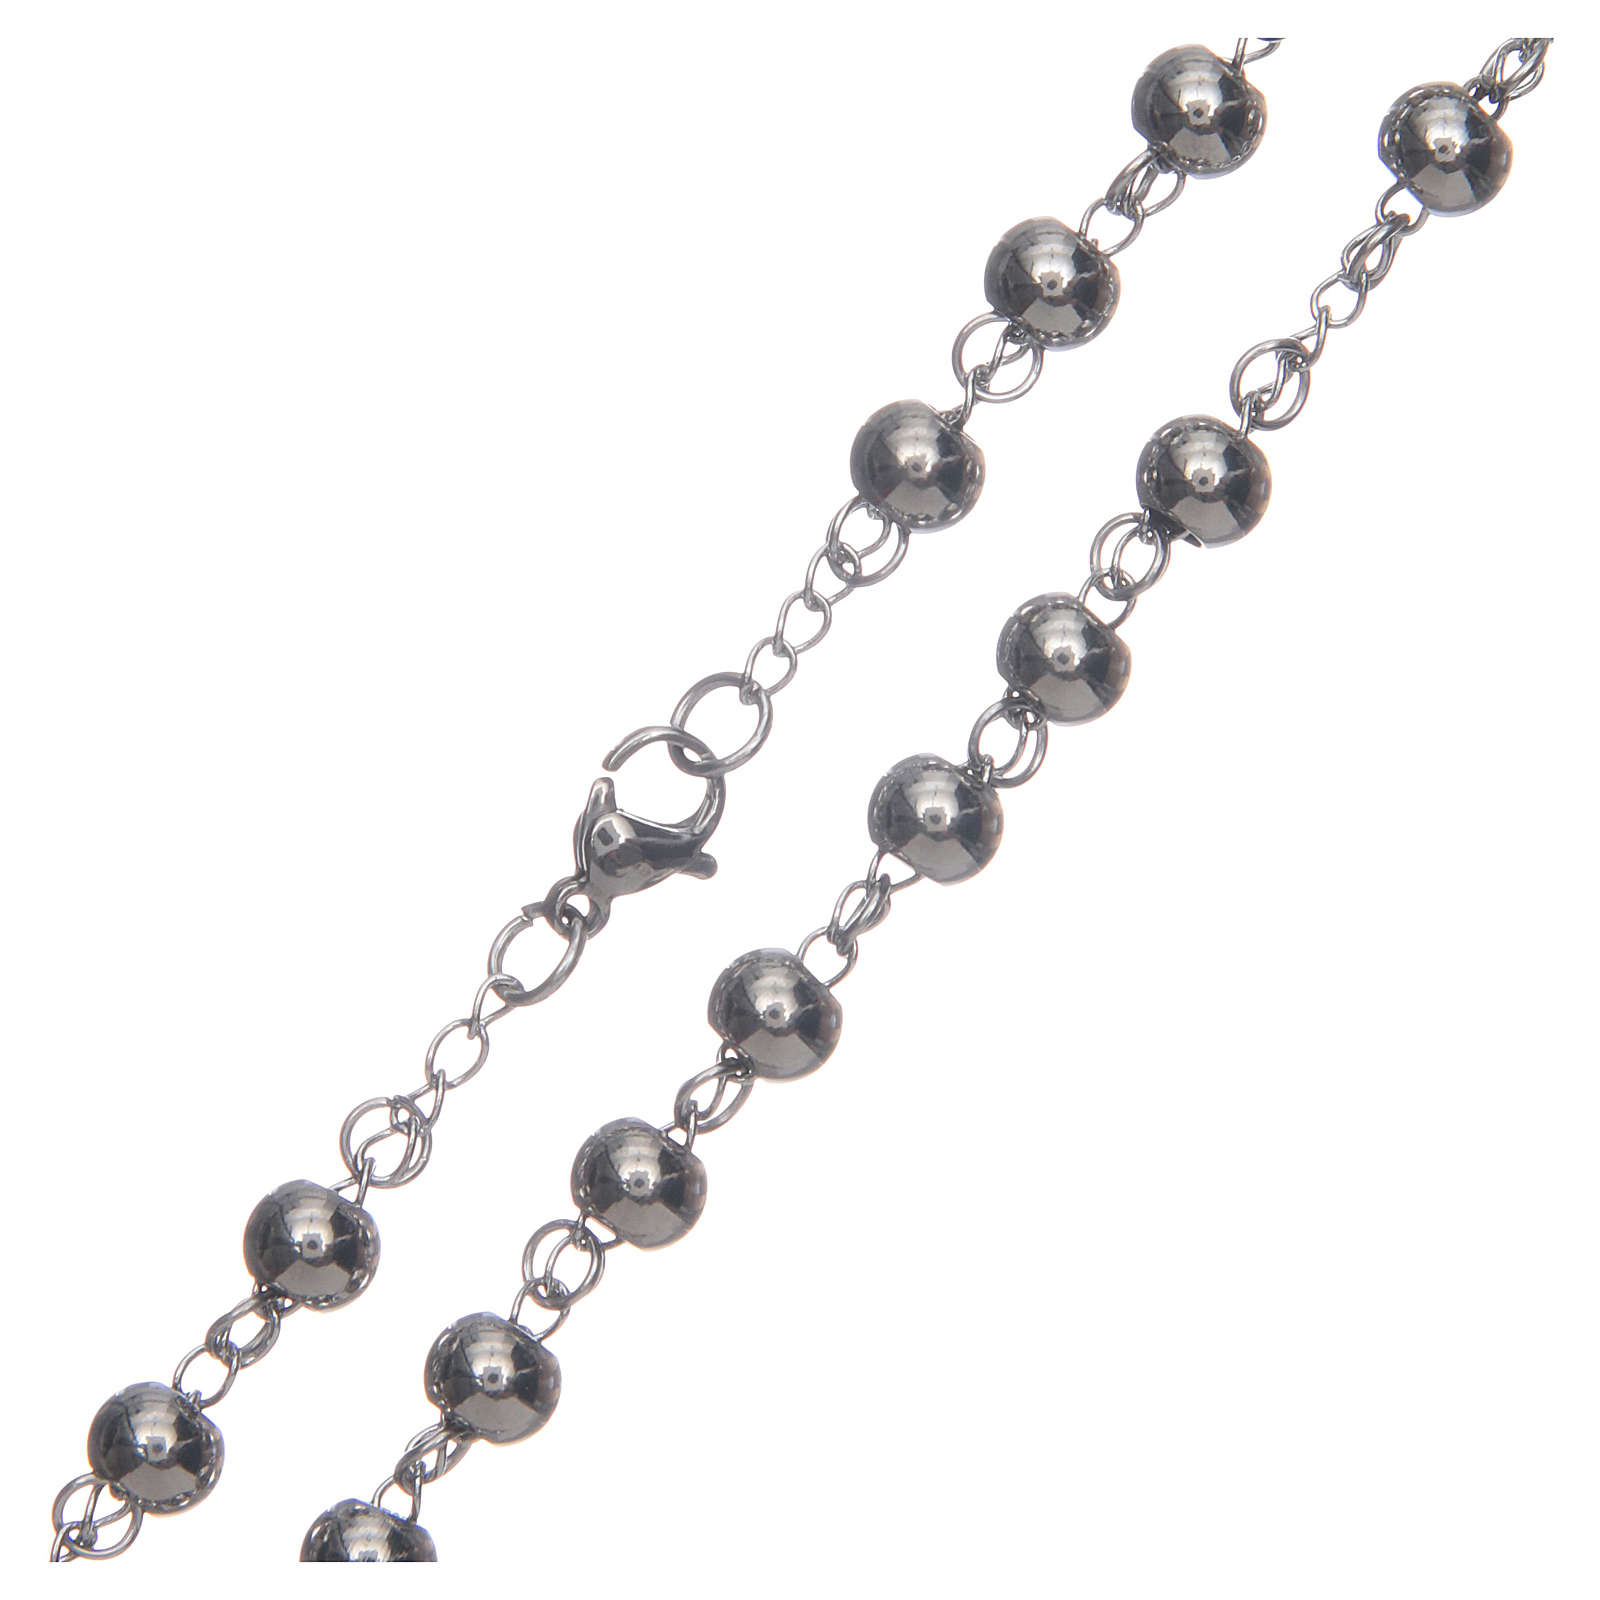 Różaniec klasyczny kolor silver kulki duże stal 316L 4